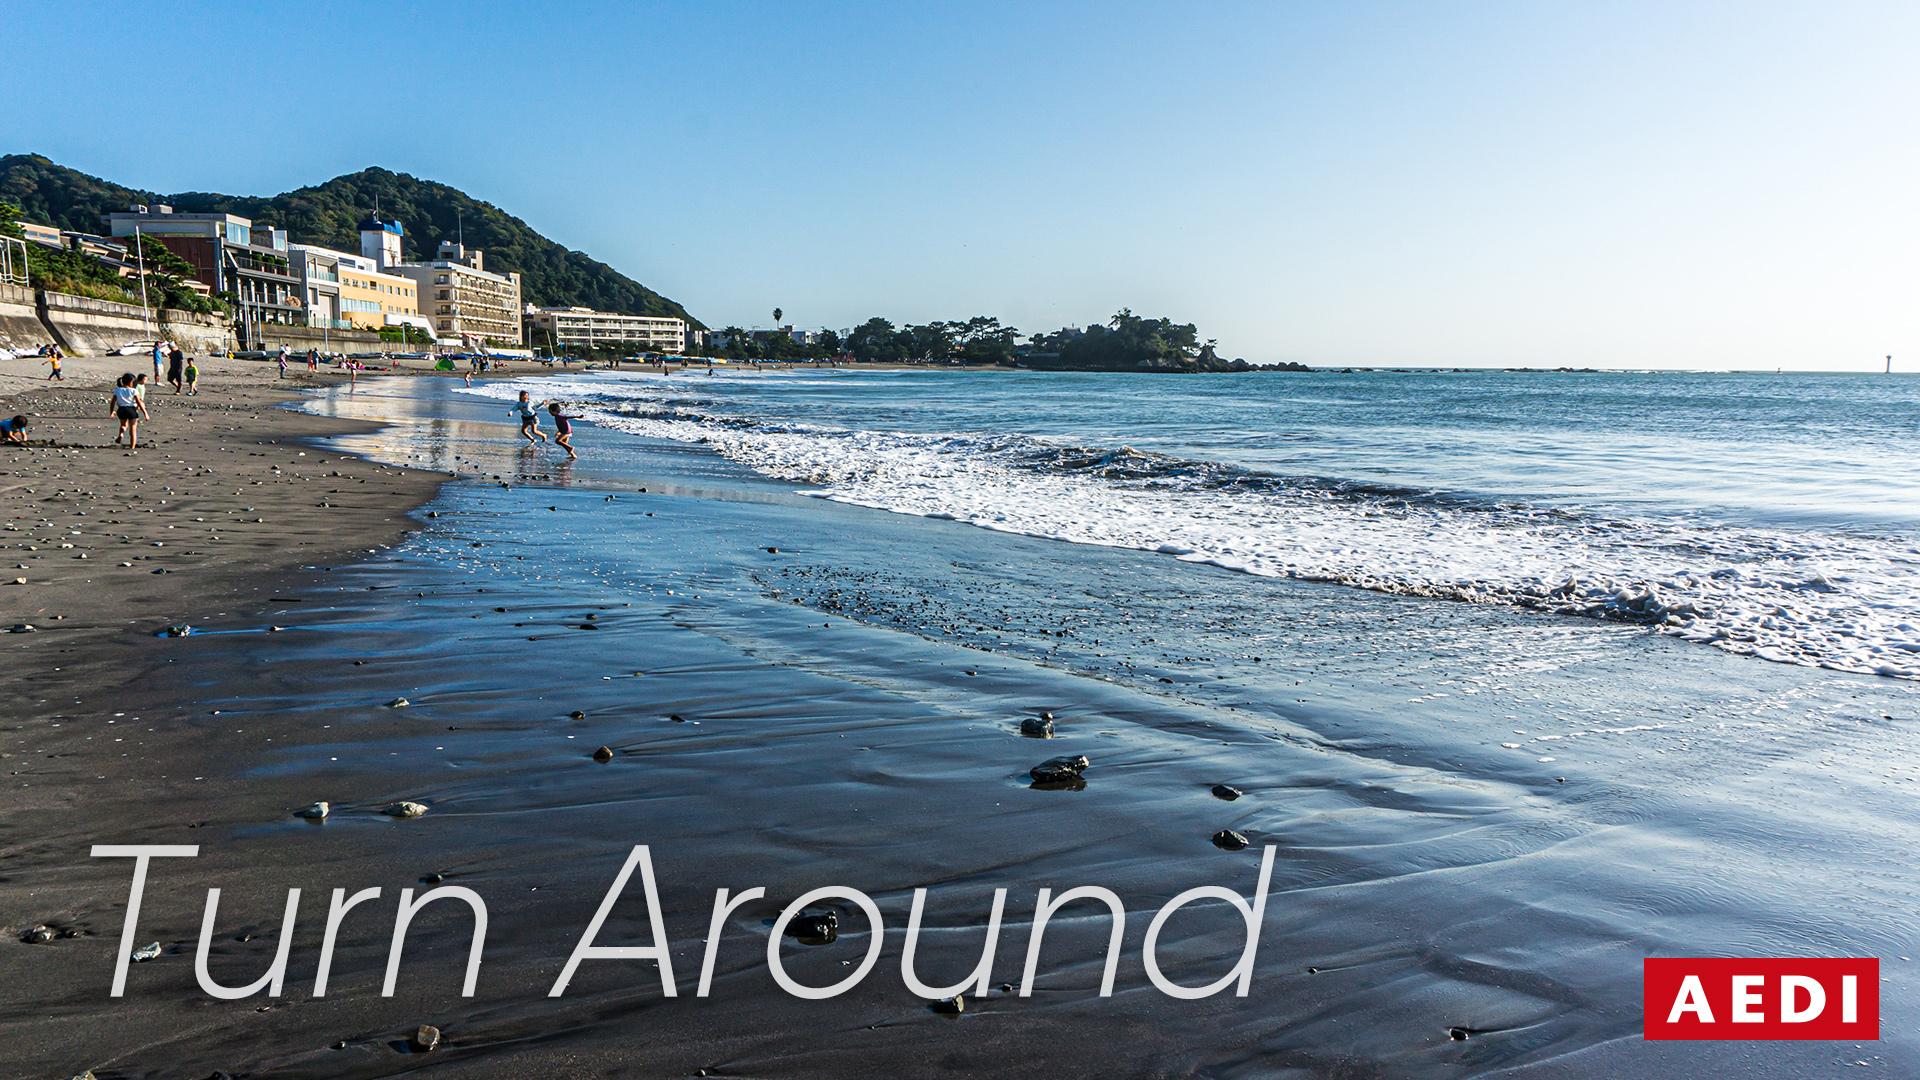 Turn Around – 好転する 回復する 岡山県倉敷市のWeb制作・デザイン会社 AEDI株式会社